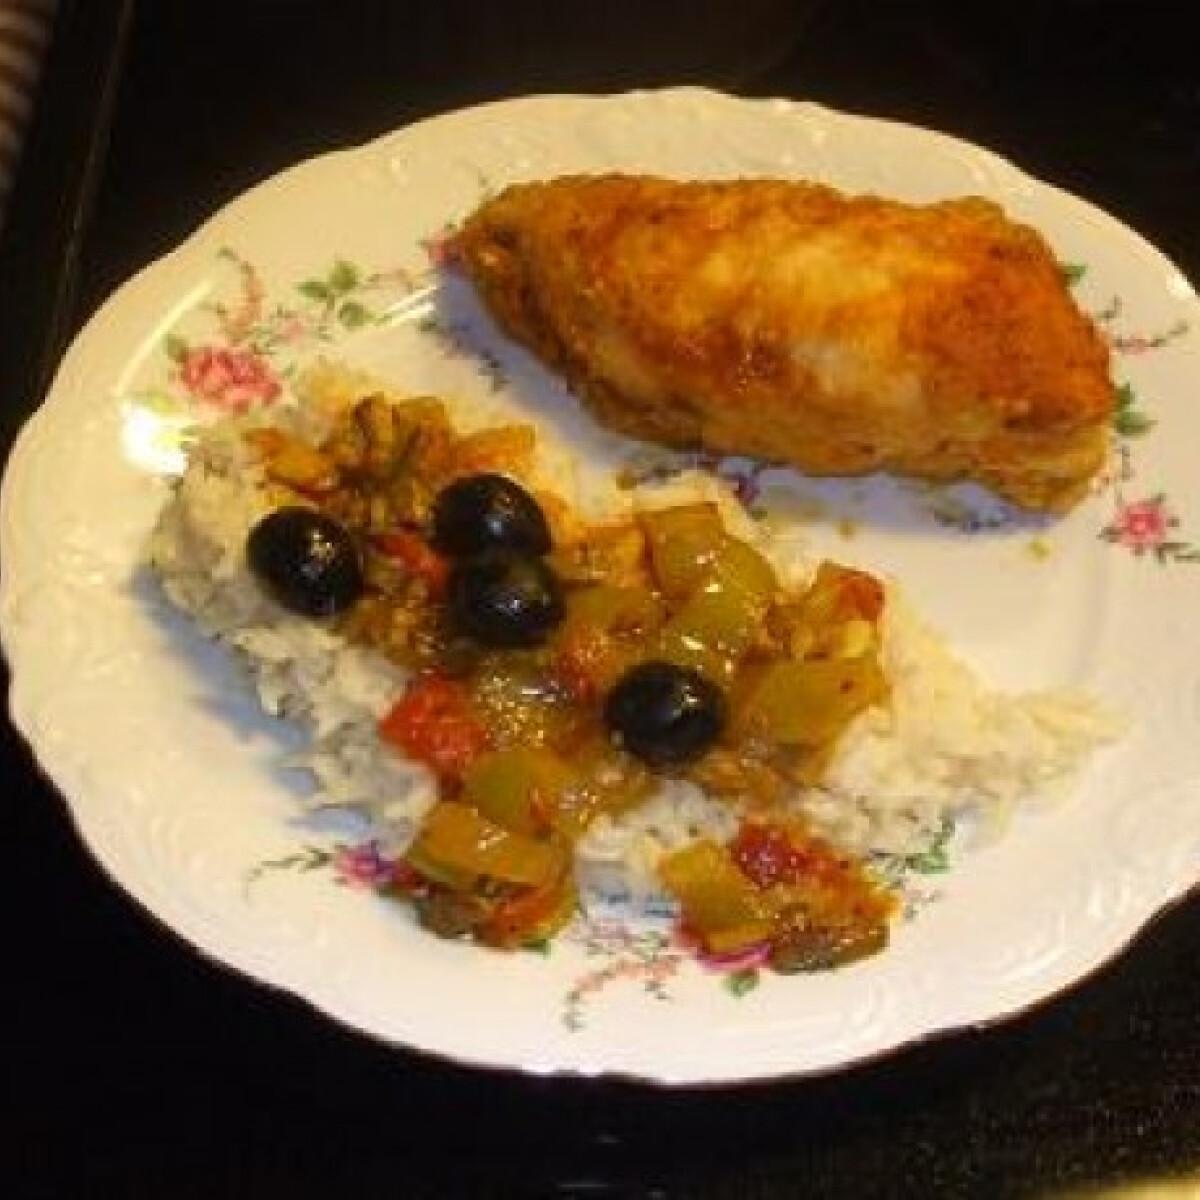 Ezen a képen: Csirke olaszosan avagy chicken cacciatore